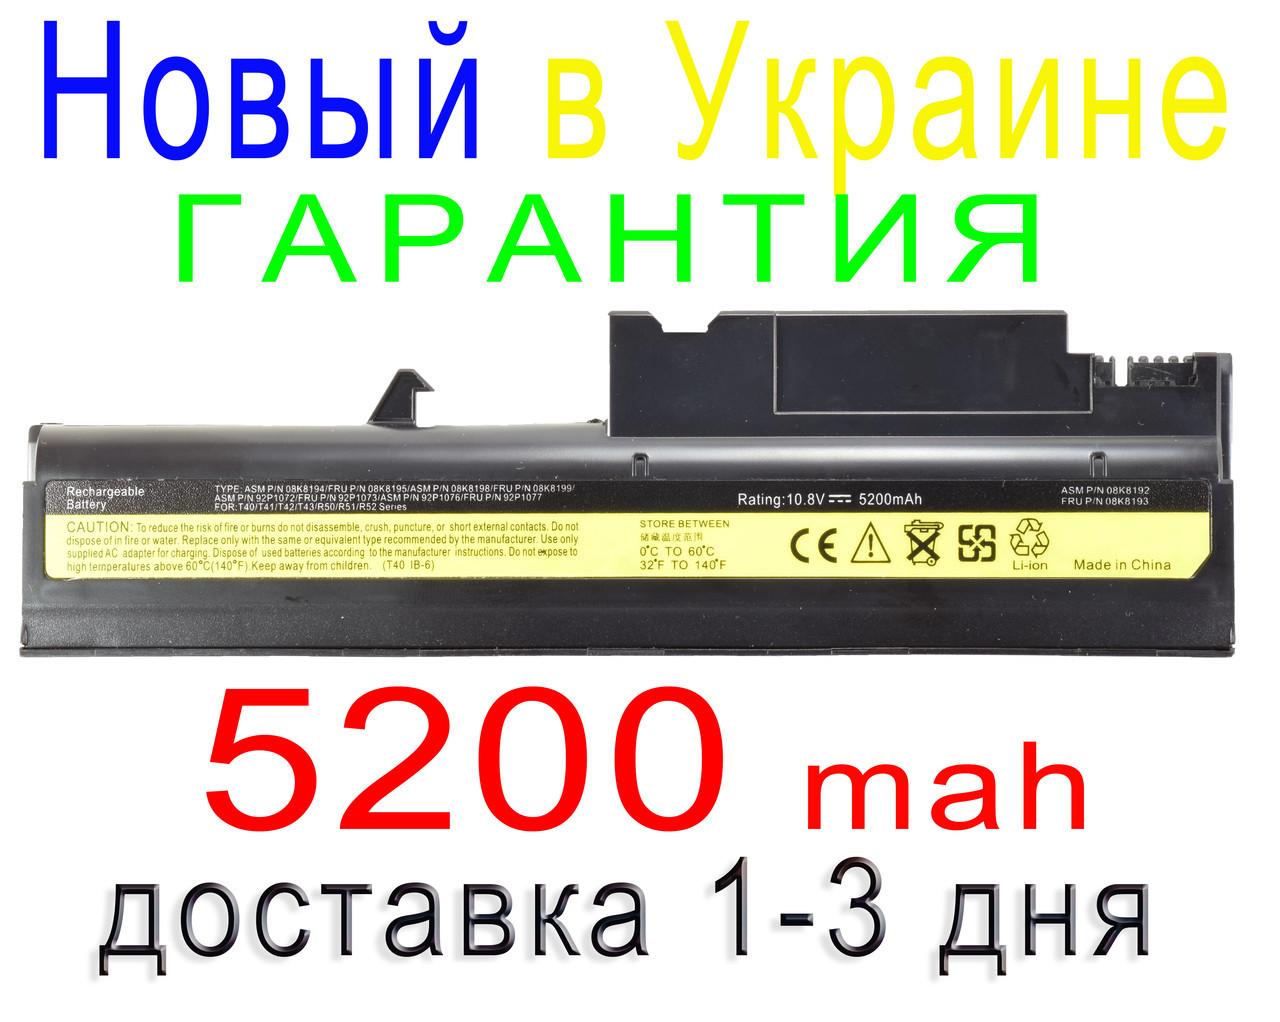 Аккумулятор батарея 92P1074 92P1075 92P1087 92P1088 92P1089 92P1090 92P1091 92P1101 93P5002 ASM